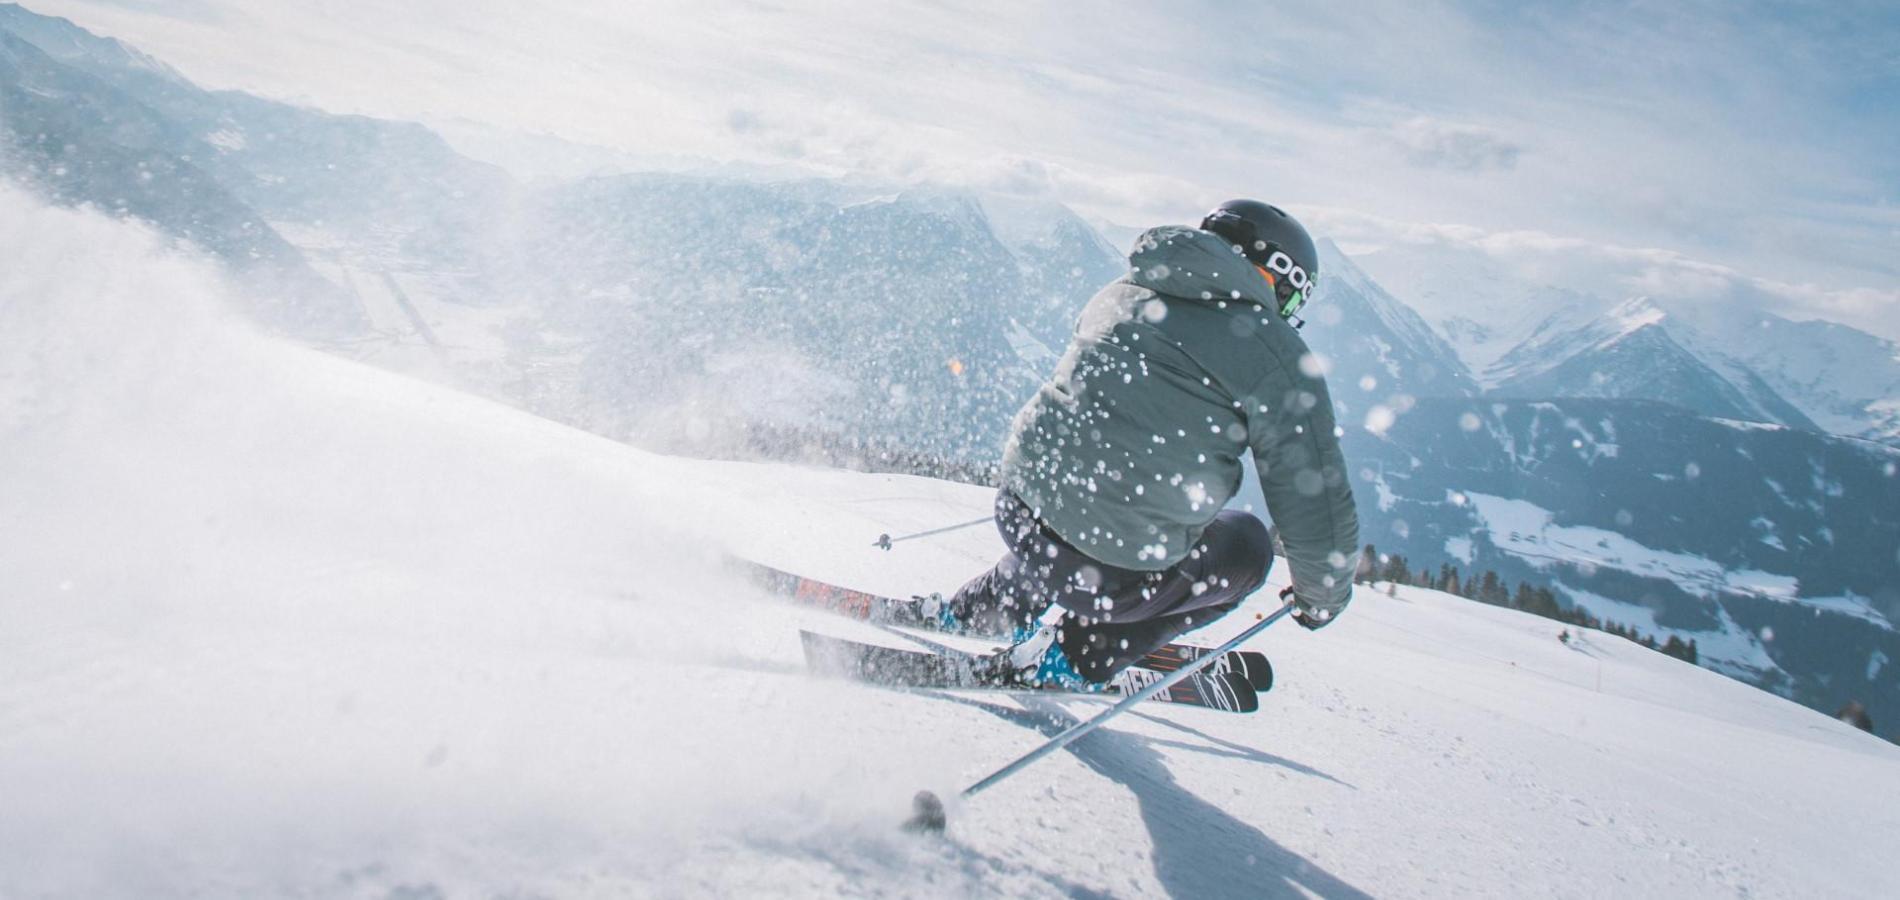 Rosskopf Wandern Skifahren In Südtirol Skigebiet Rodeln Sterzing 4Lq35AjR